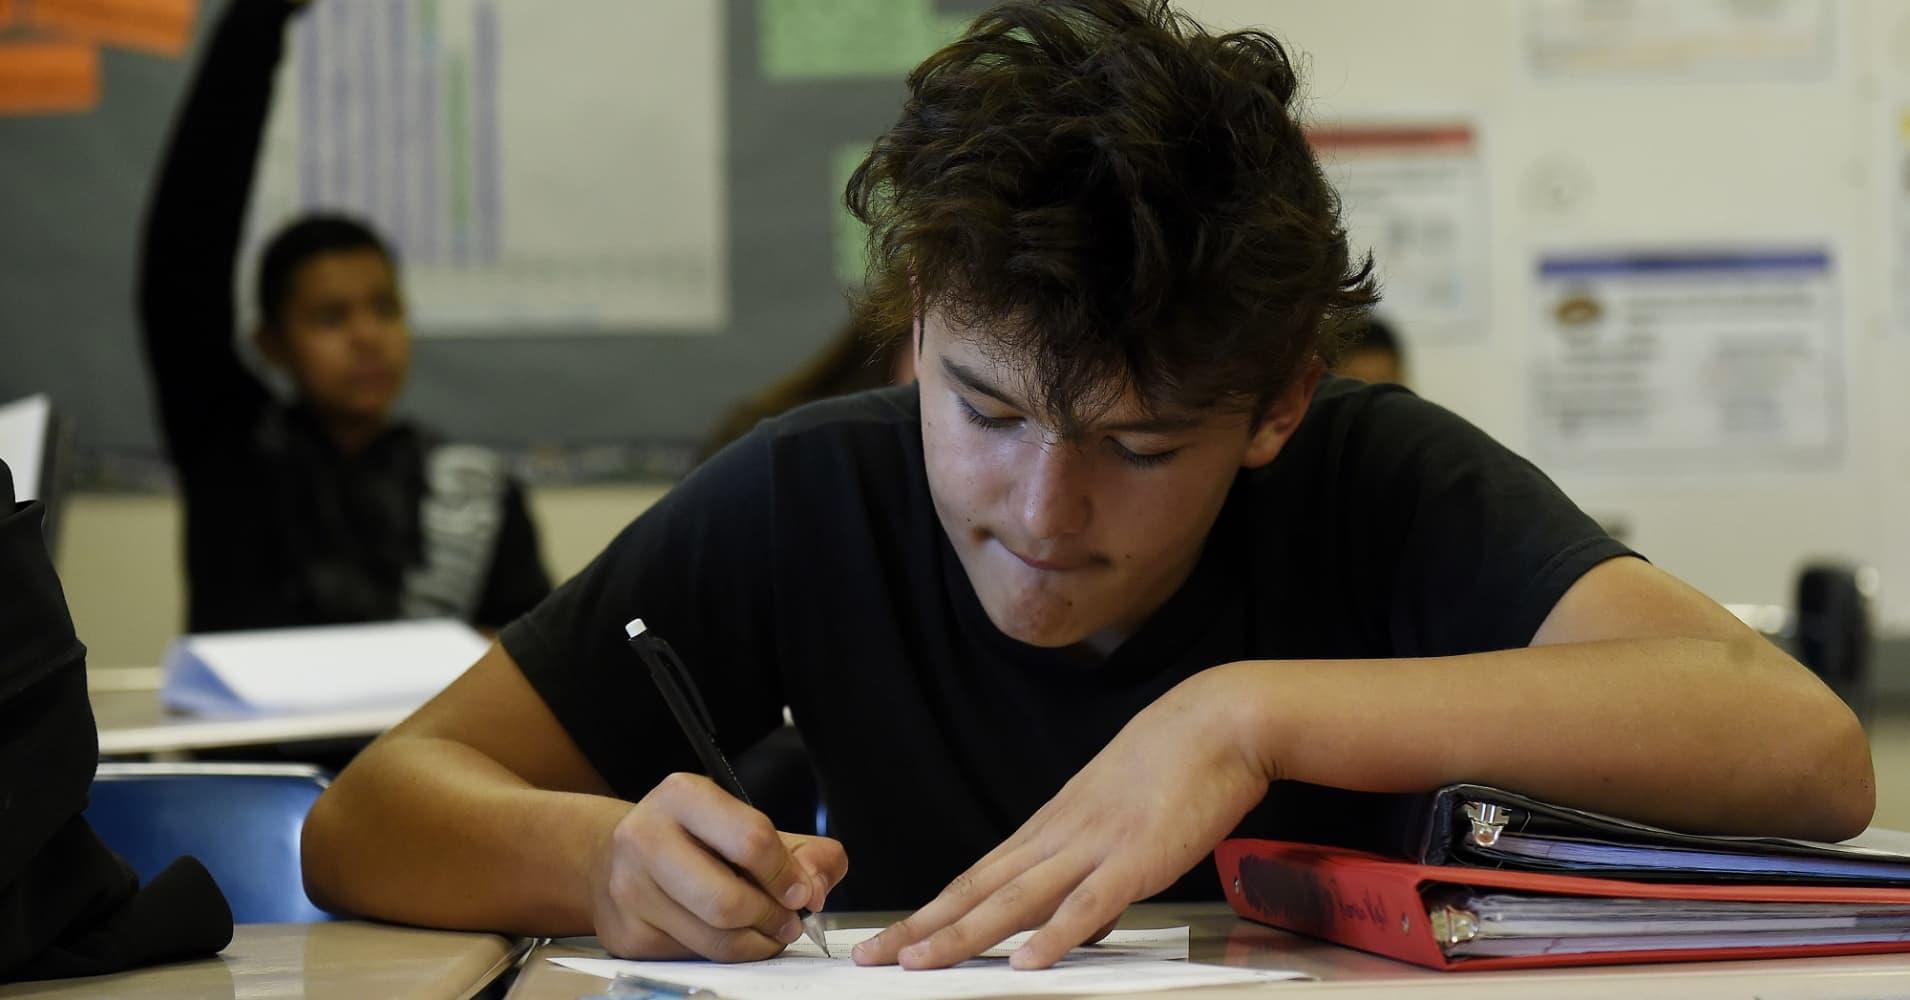 Eighth grade algebra class at Vikan Middle School in Brighton, Colorado